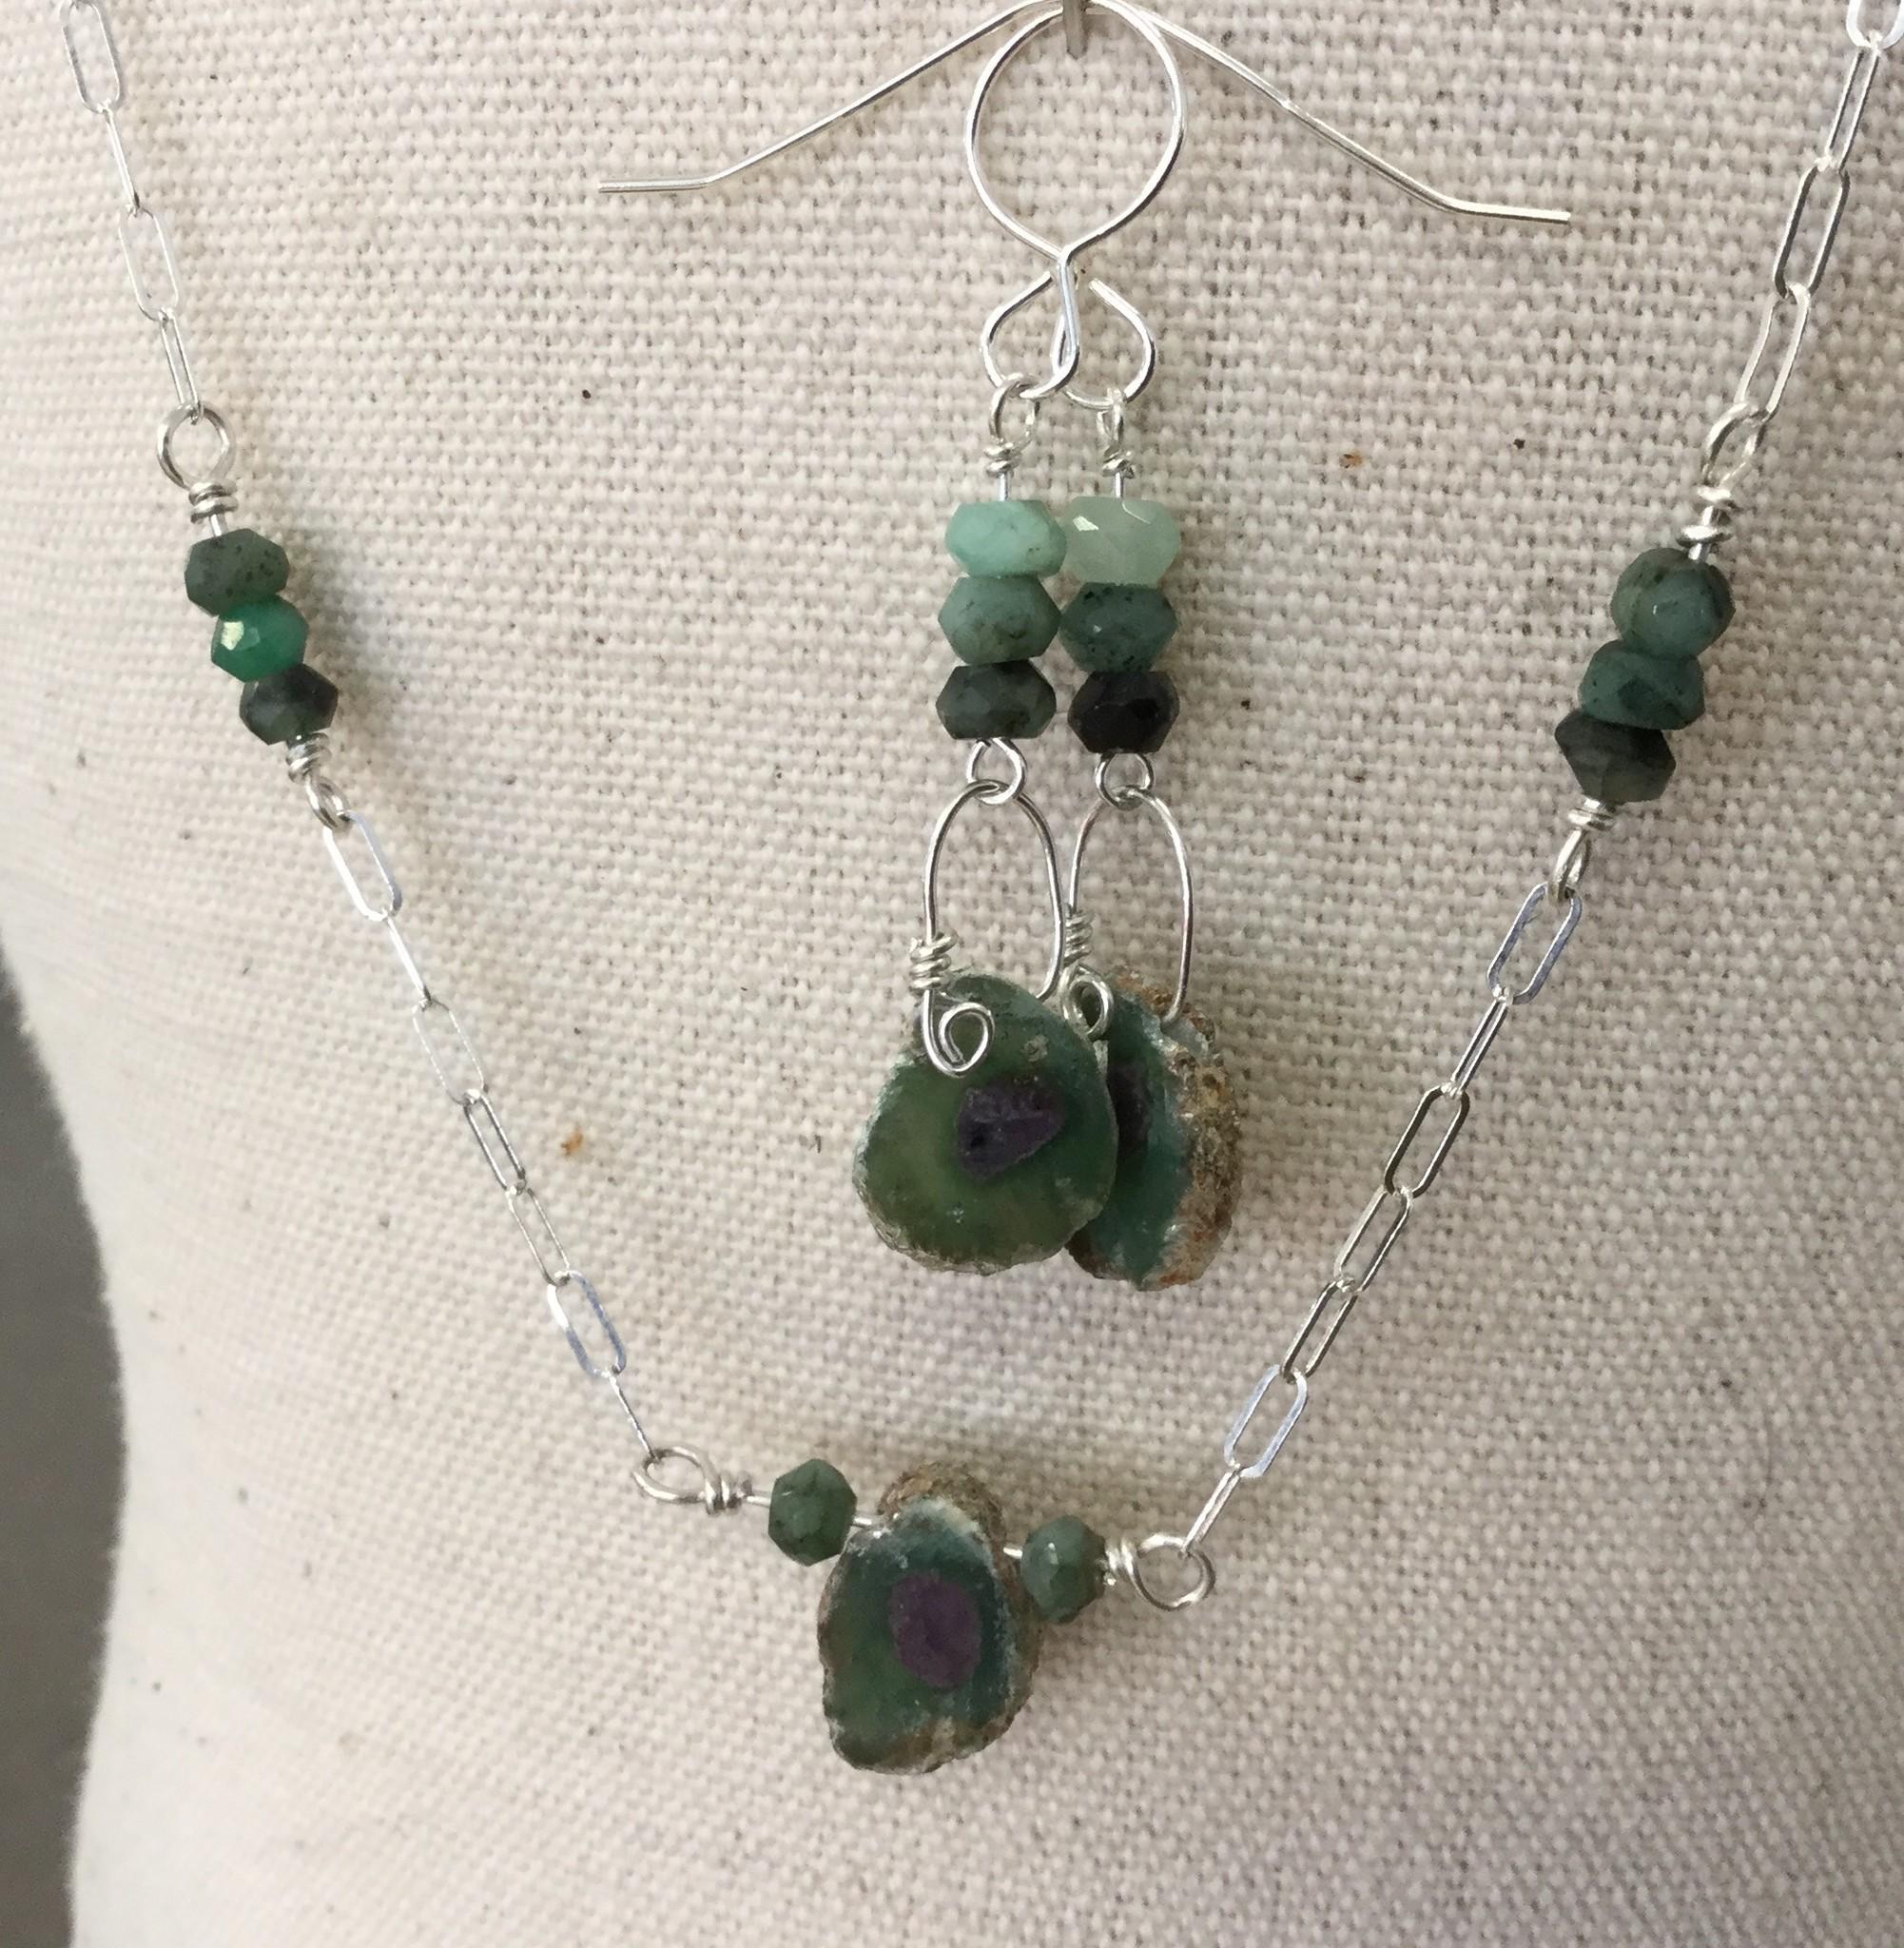 Ruby in Zoisite Necklace & Earrings Set